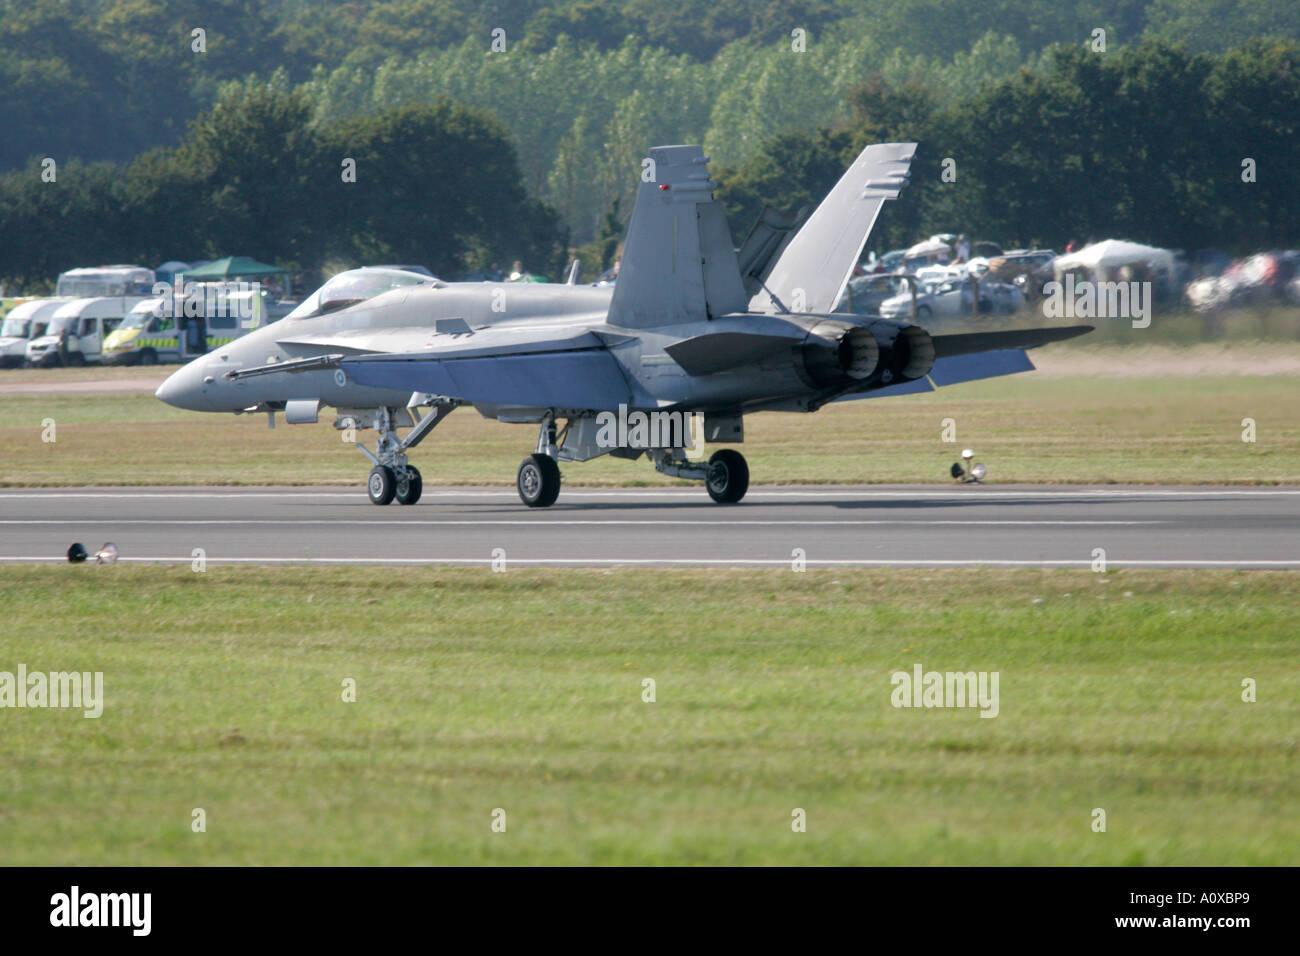 Finnish AF F 18C Hornet comes to a halt on runway RIAT 2005 RAF Fairford Gloucestershire England UK - Stock Image